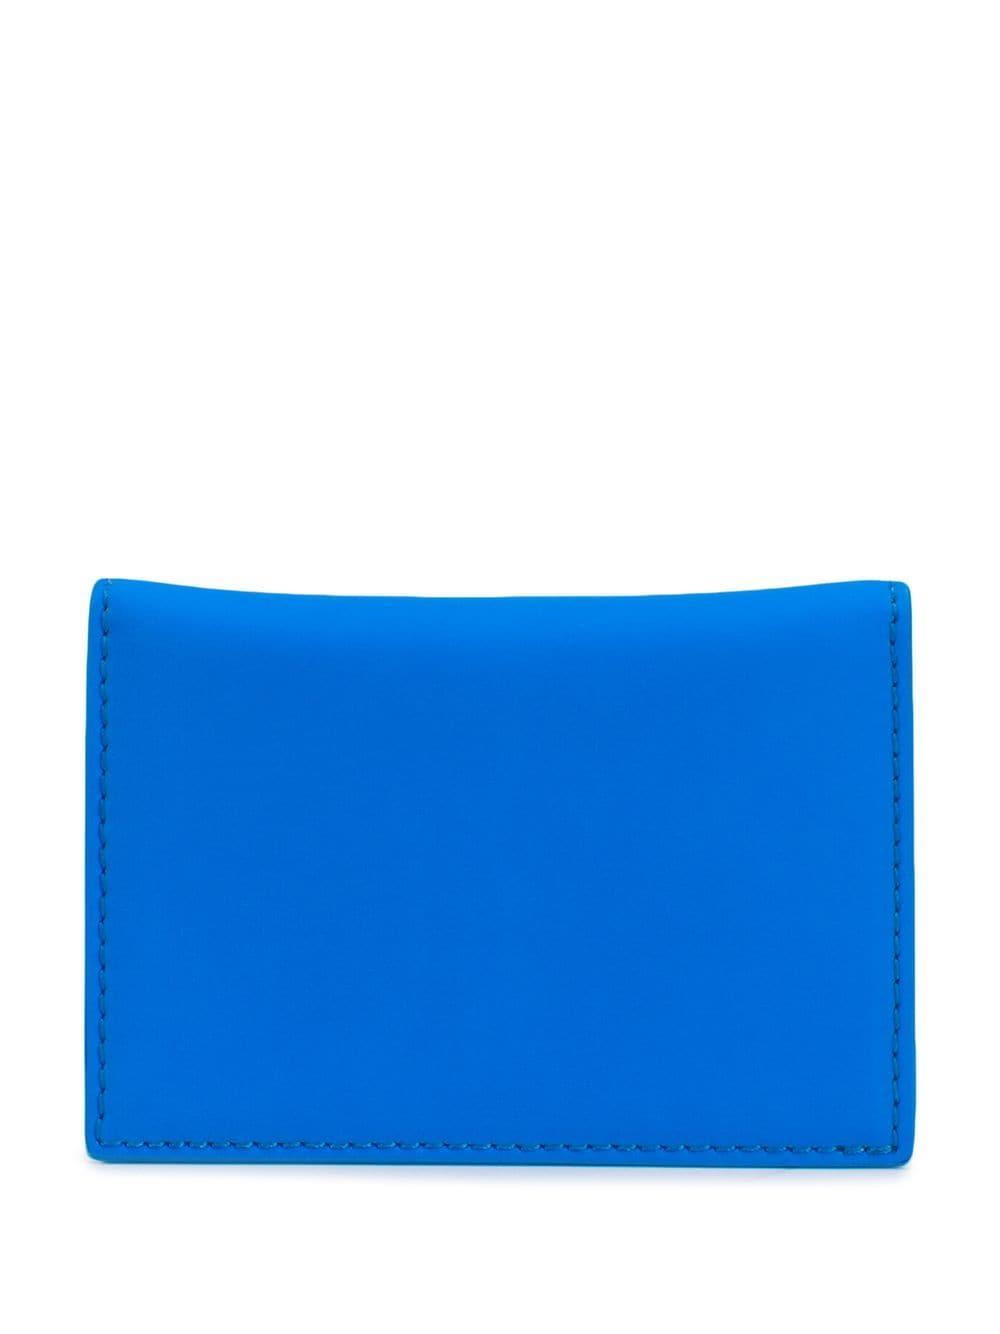 01d9f805a156 Lyst - Off-White c o Virgil Abloh Arrow Logo Cardholder in Blue